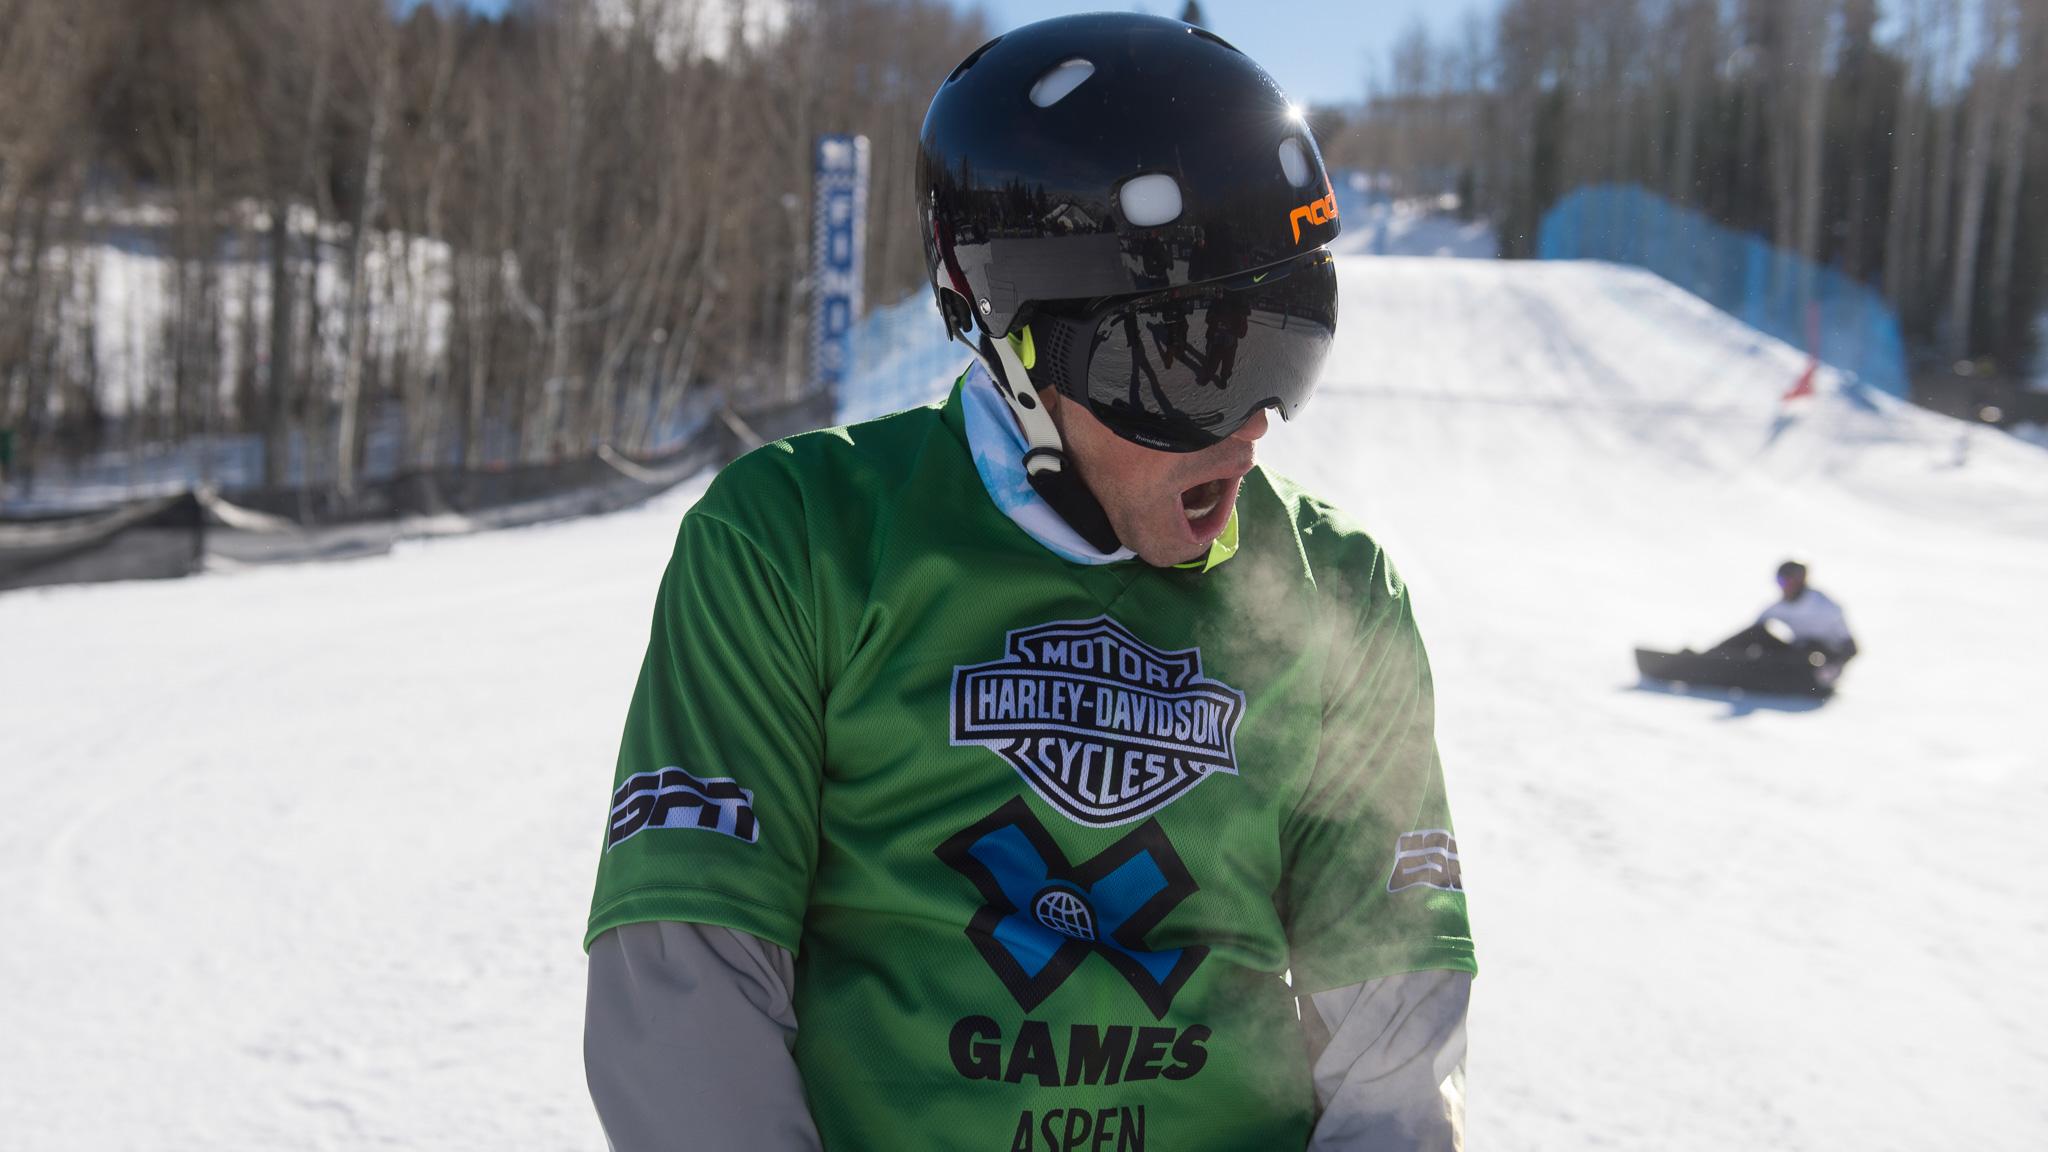 Adaptive Winner: Keith Gabel